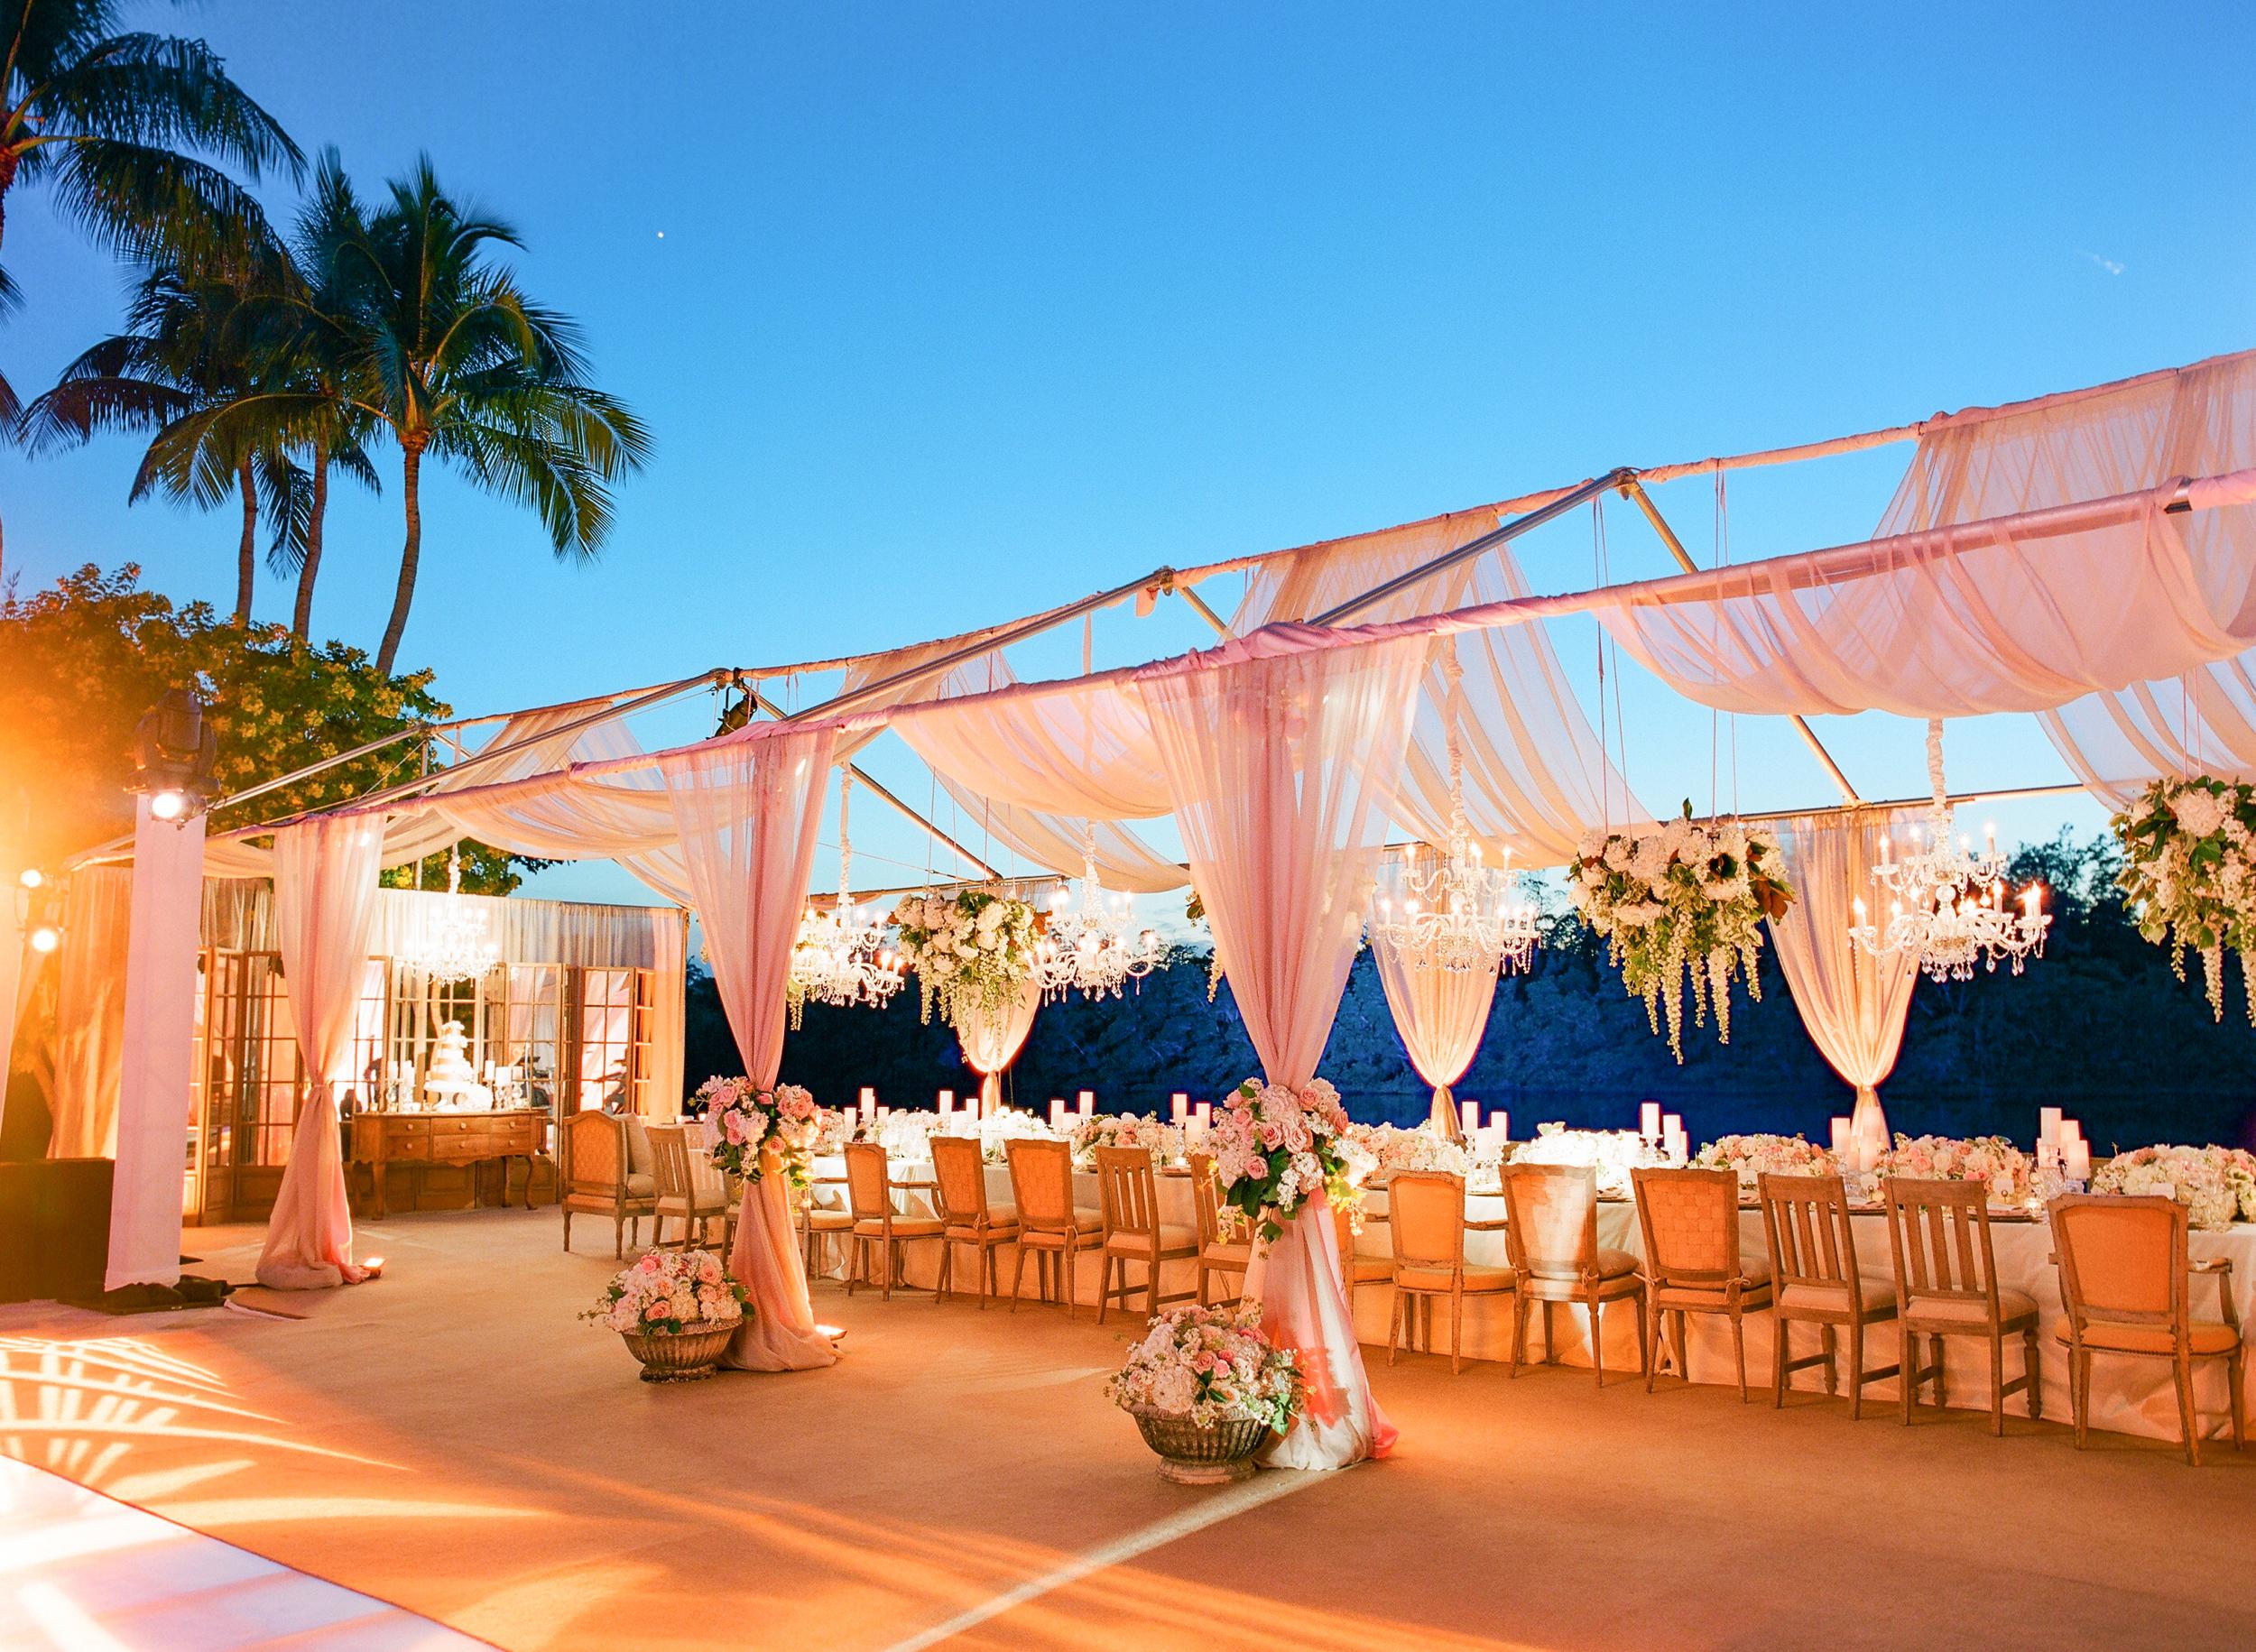 Ceci_New_York_Florida_Wedding_Style_Bride_Watercolor_Real_Custom_Luxury_131.jpg